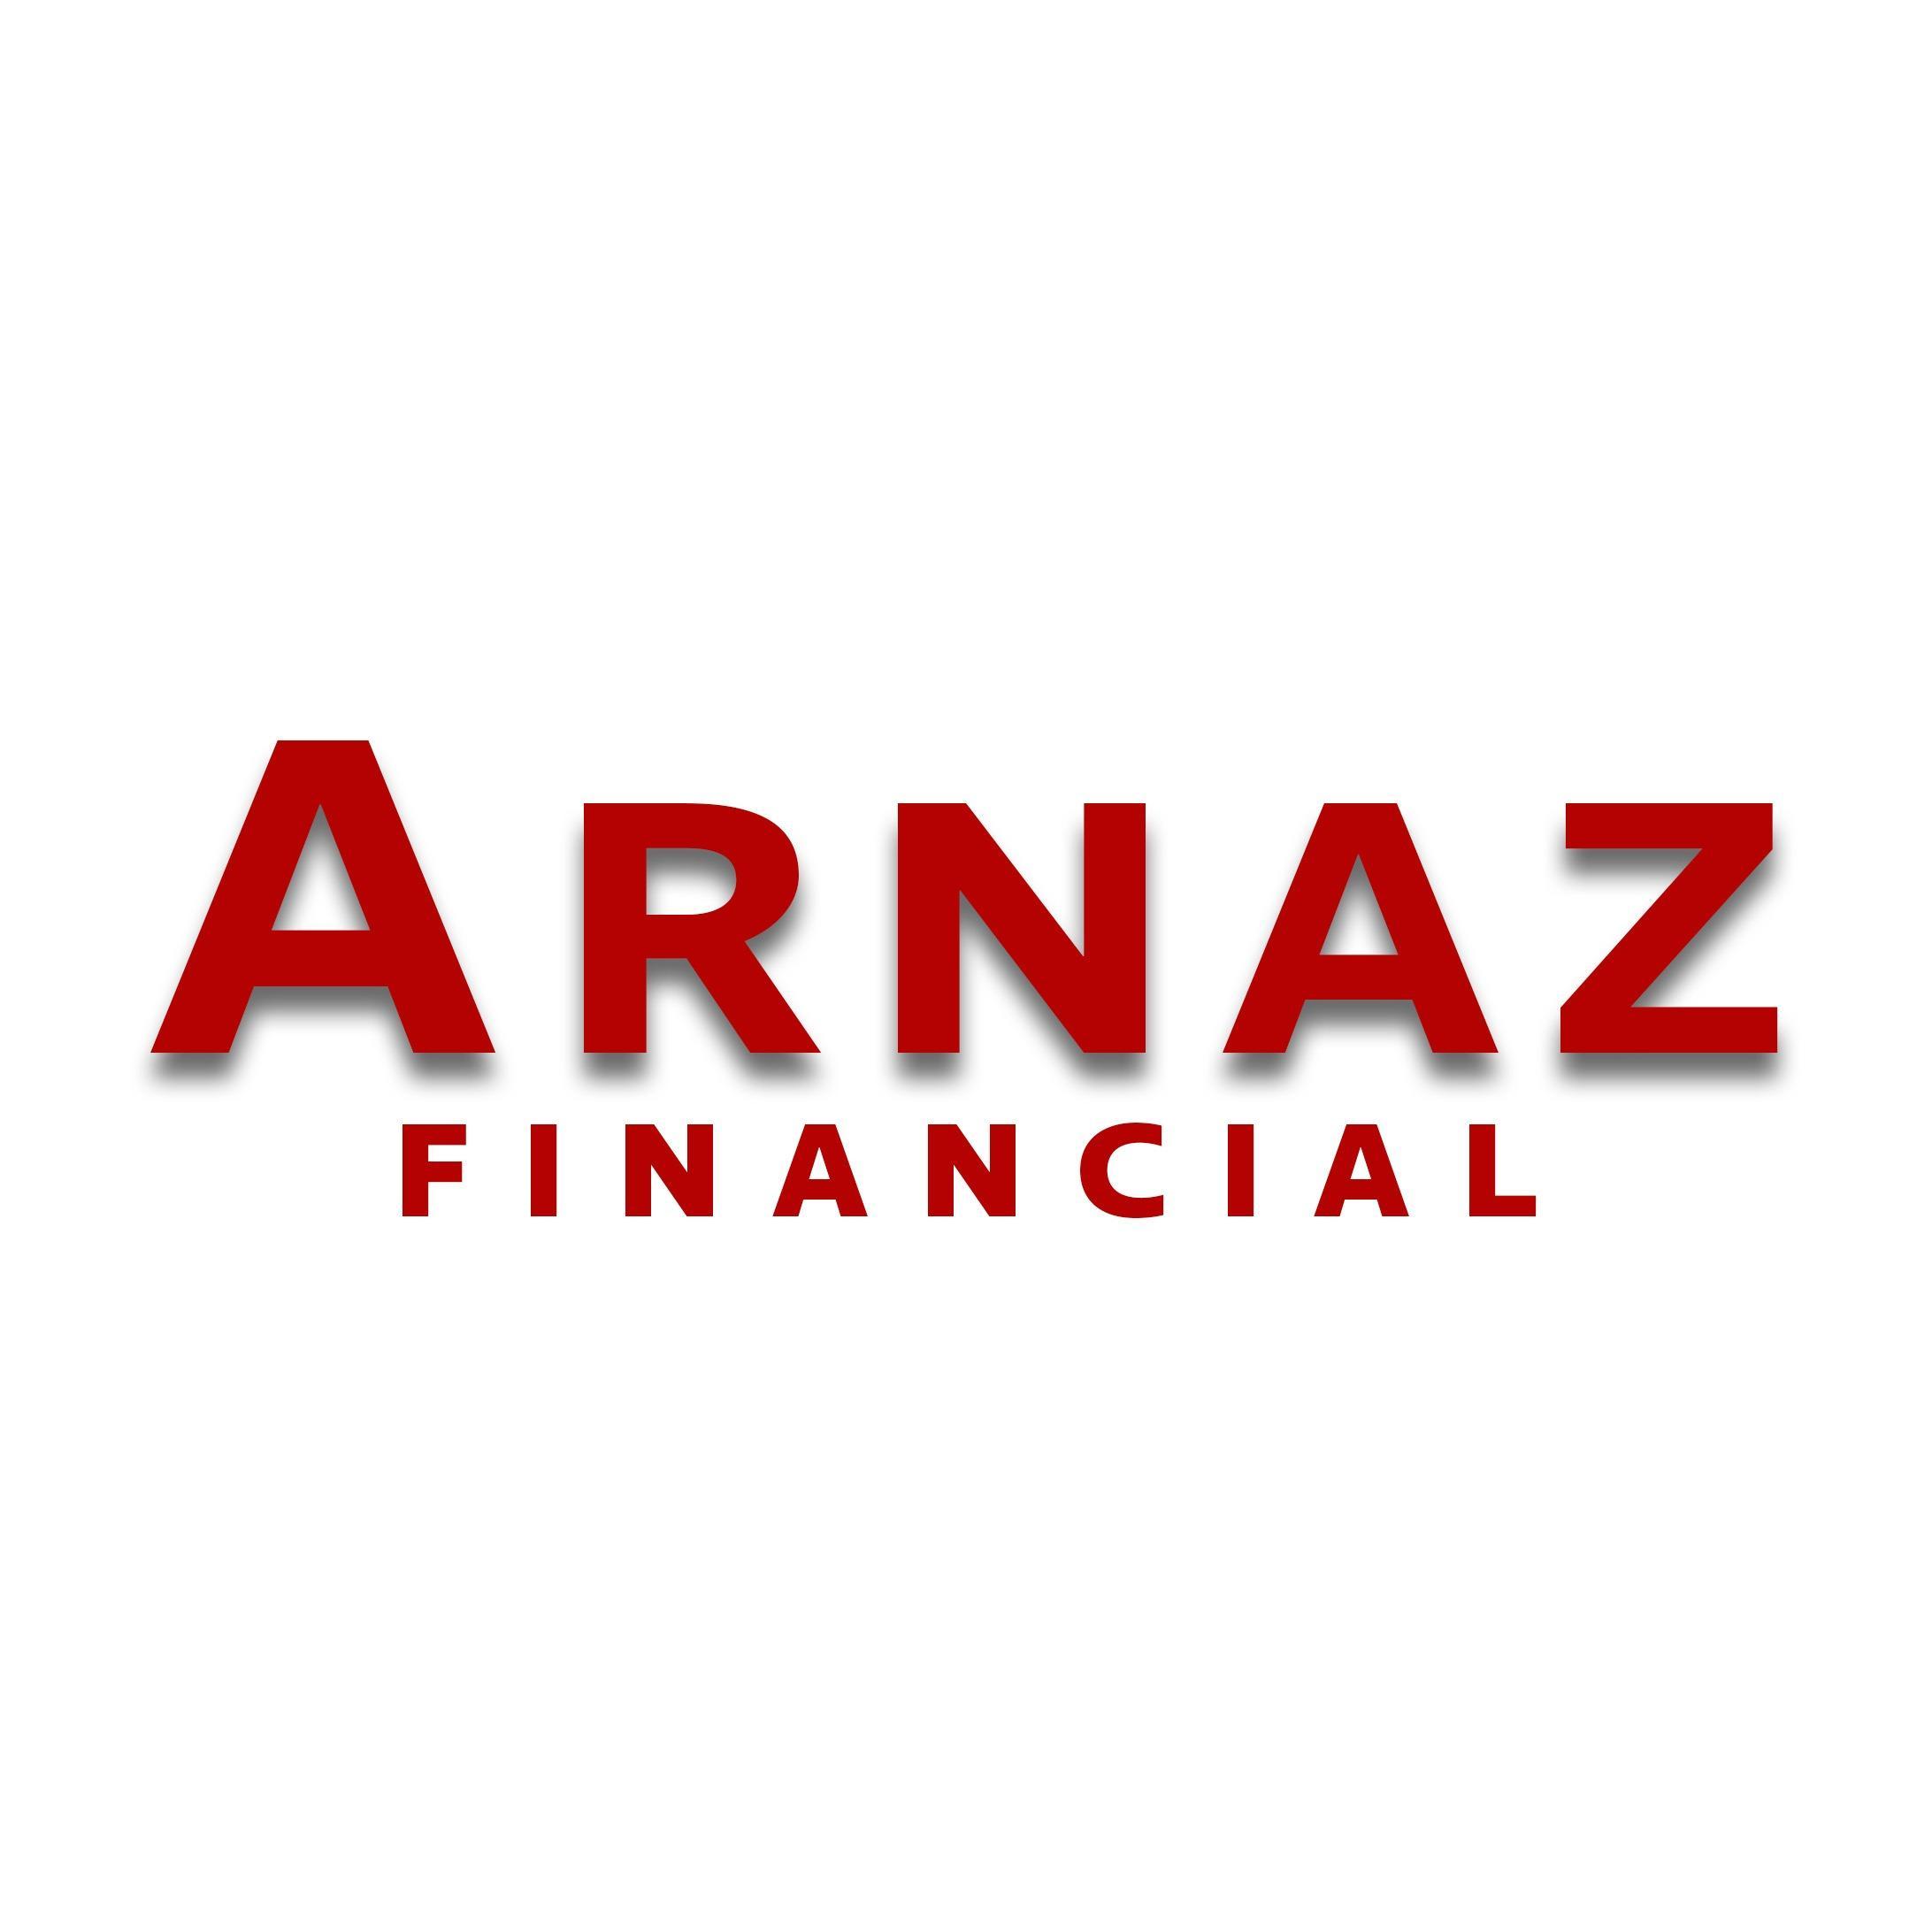 Arnaz Financial, Inc. image 1